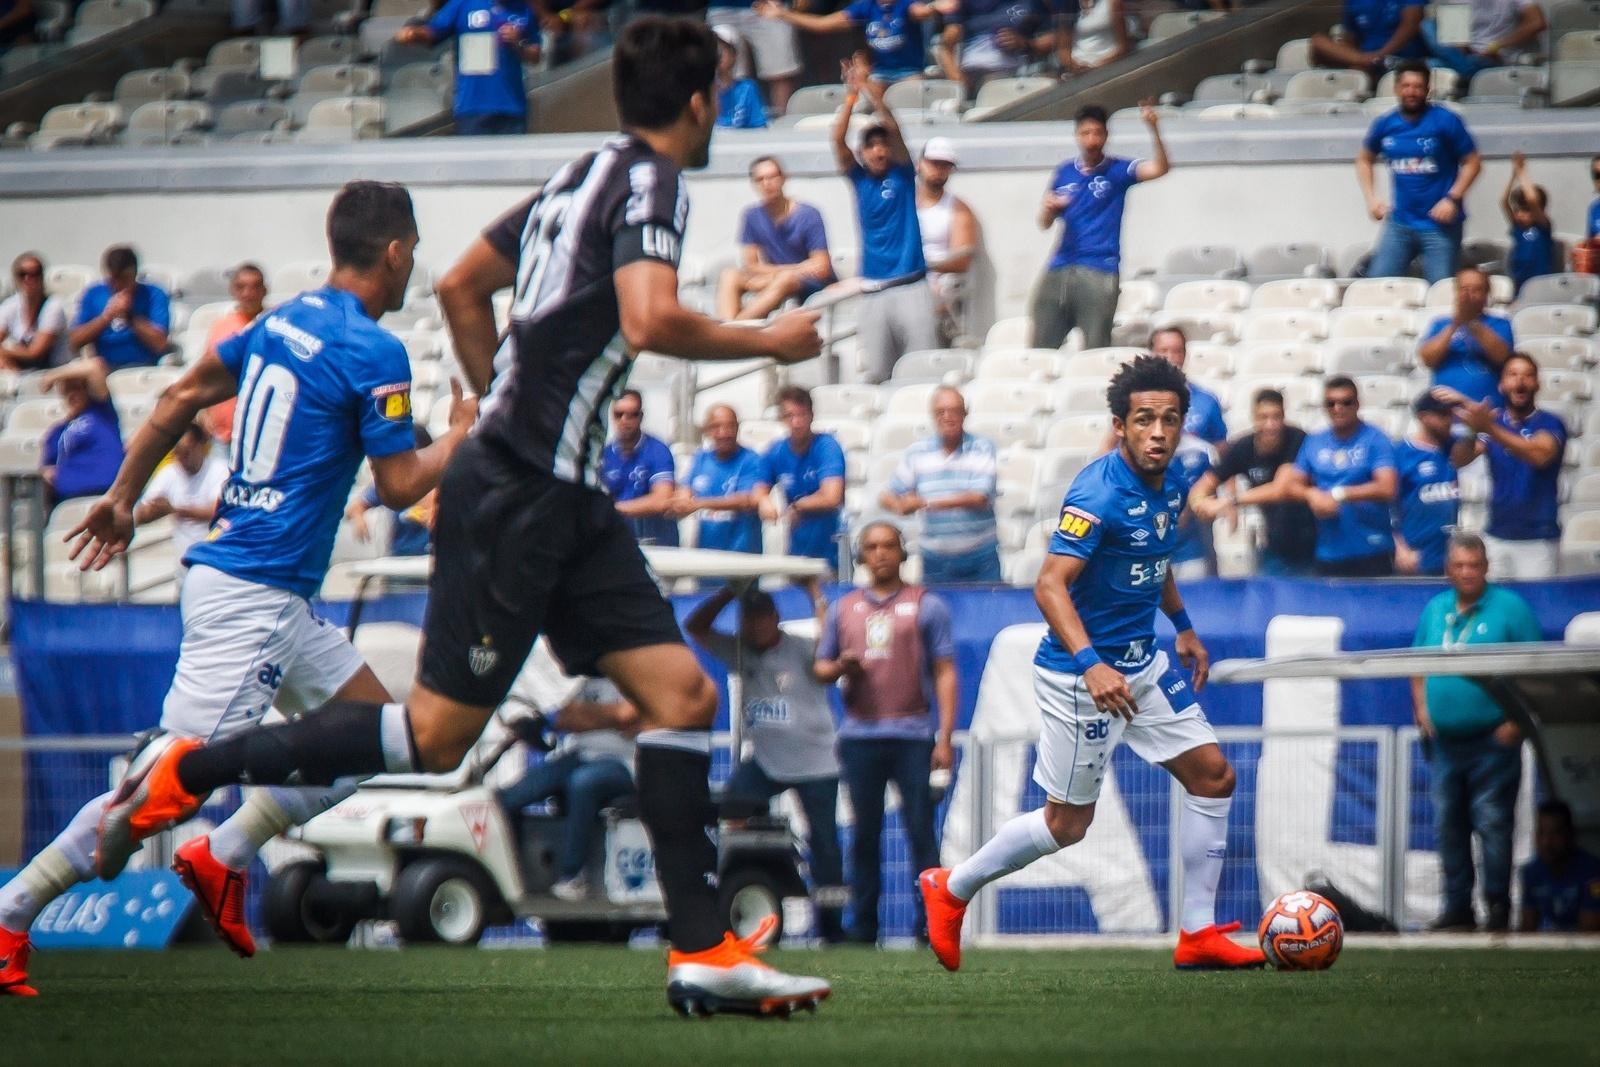 Cruzeiro MG vs Atletico Mineiro